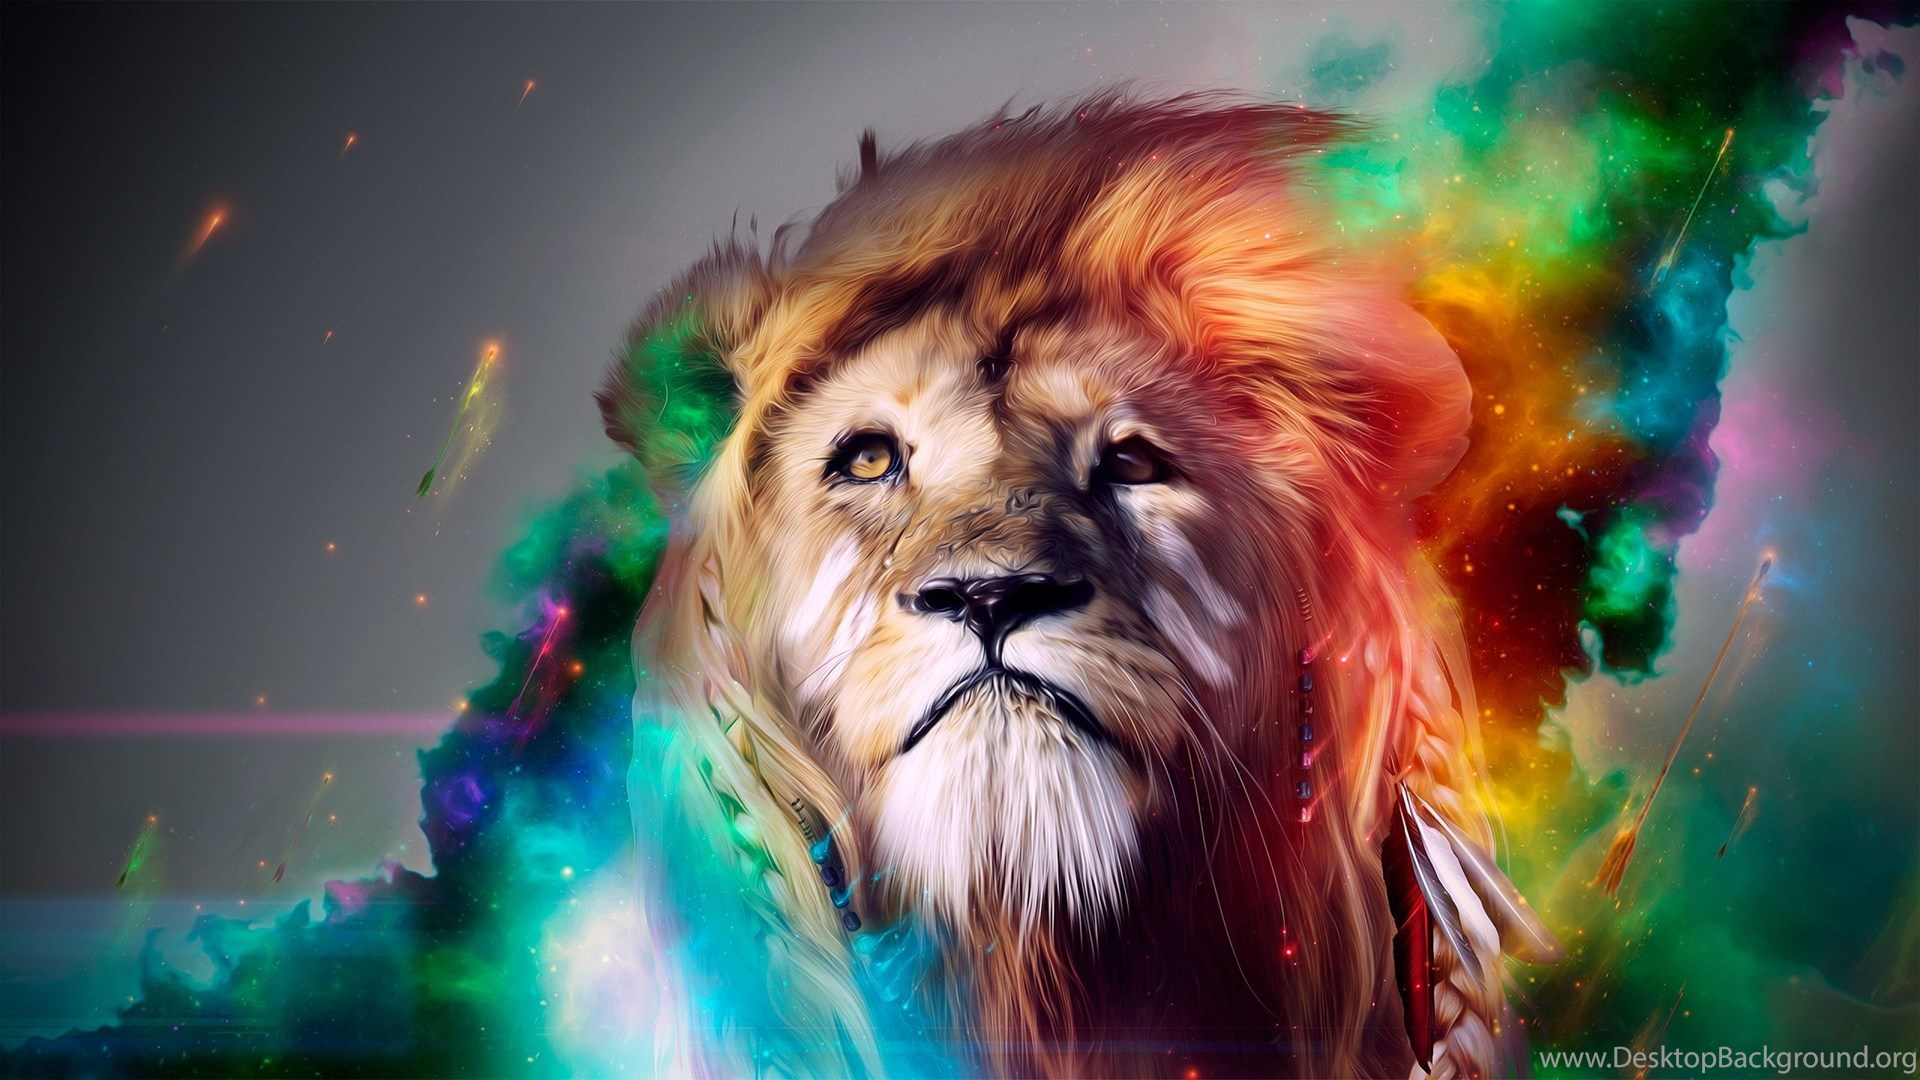 4k Ultra Hd Lion Wallpapers Hd Desktop Backgrounds 3840x2160 Desktop Background